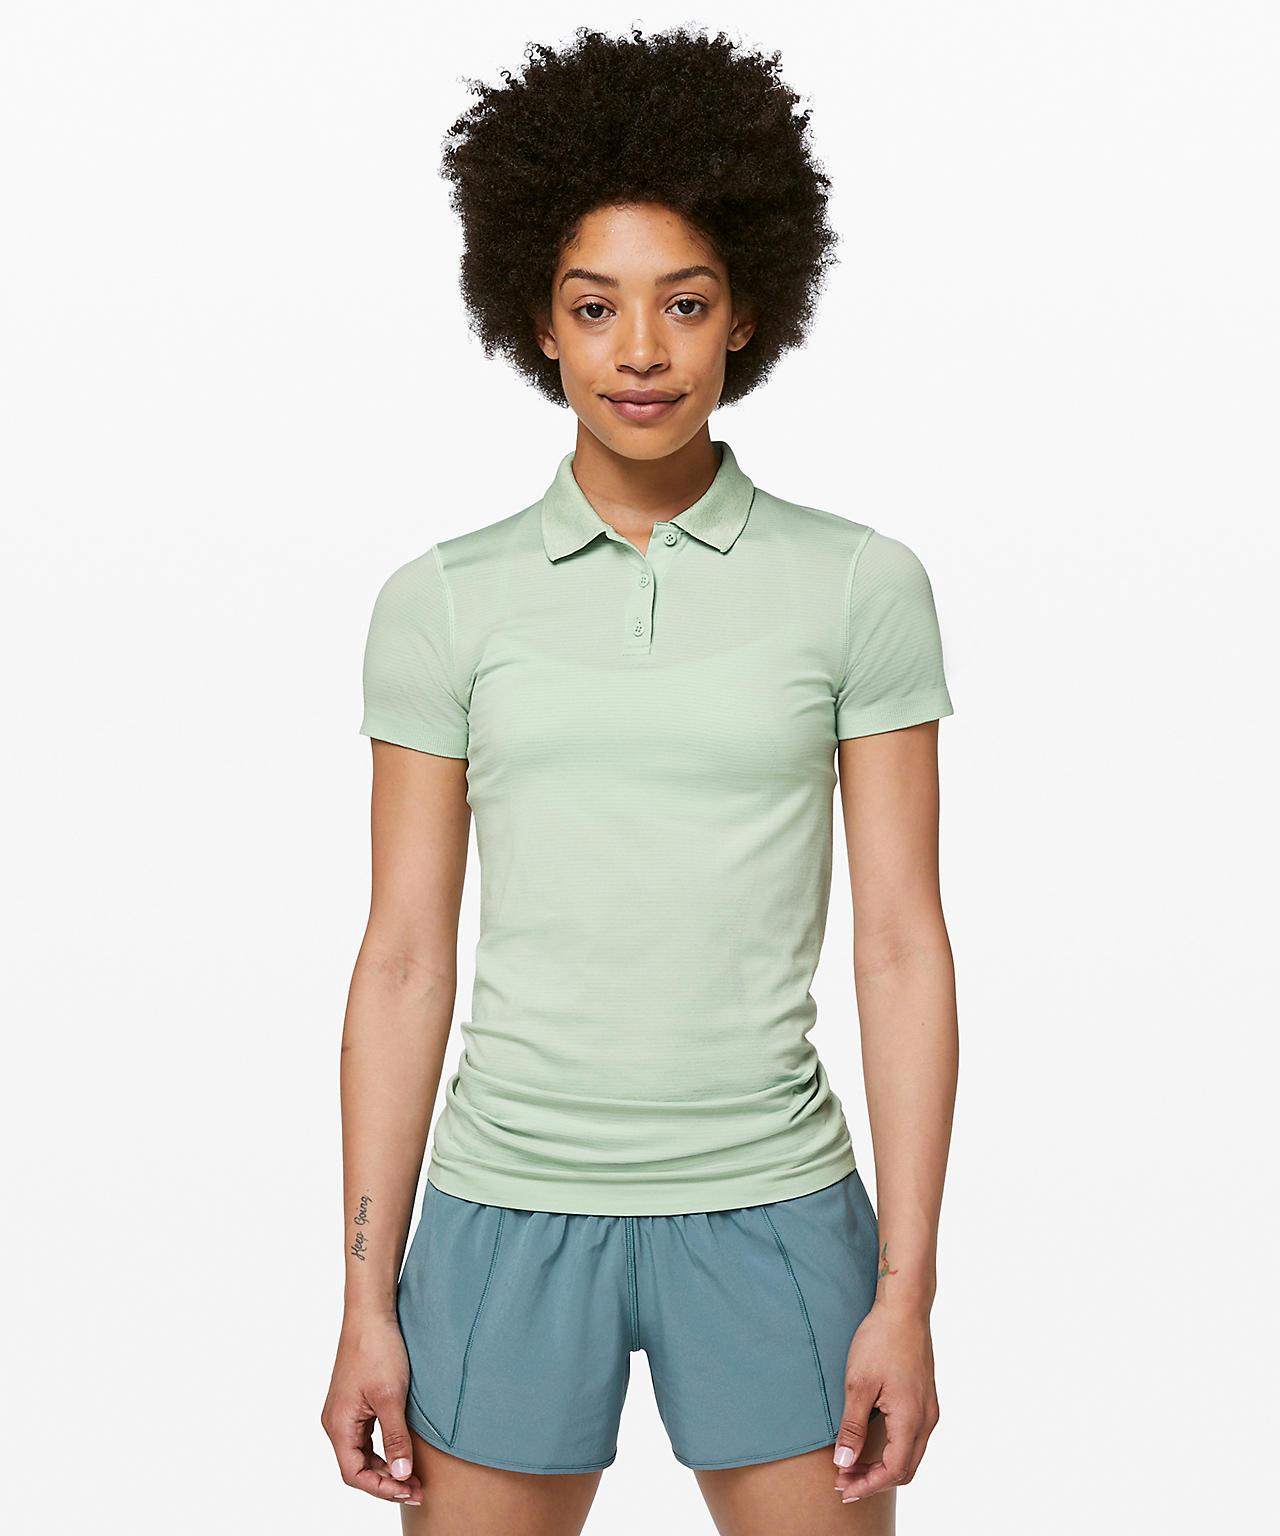 Swiftly Speed Polo Shirt